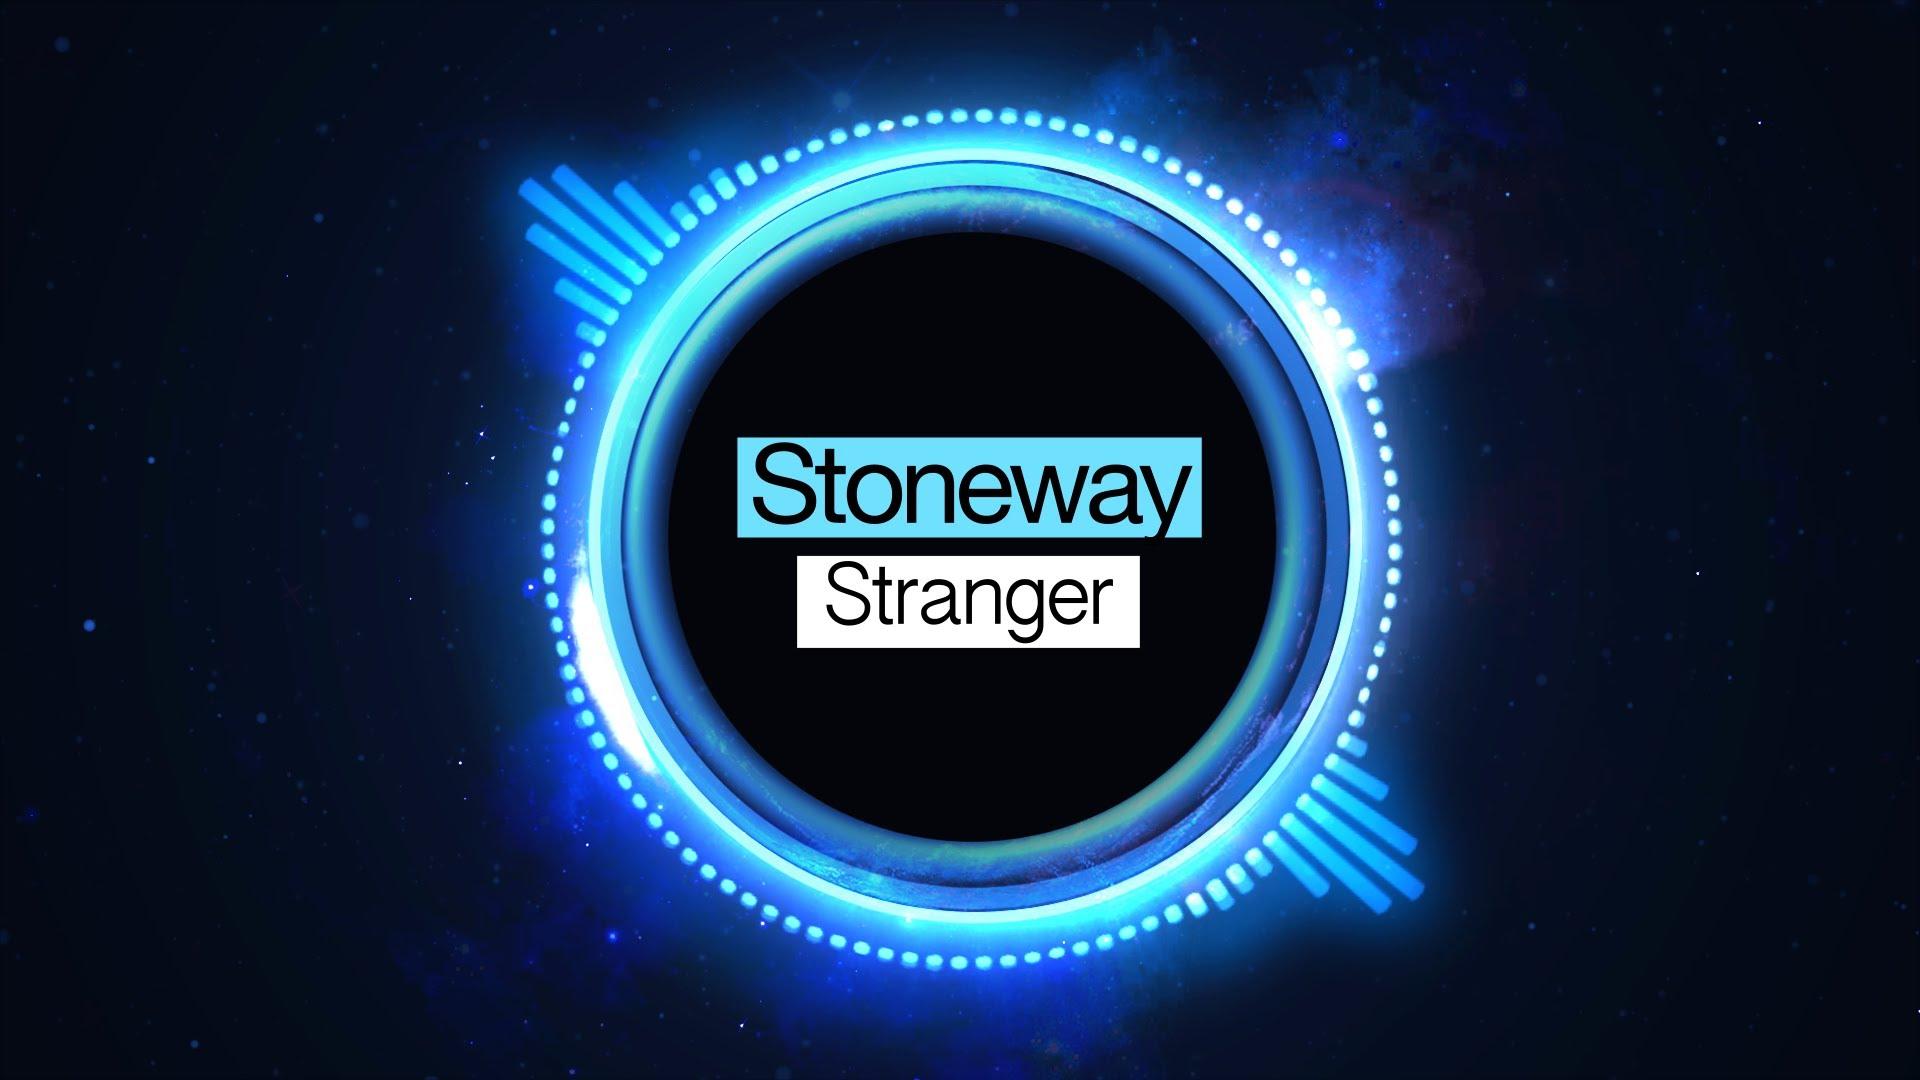 Stoneway - Stranger